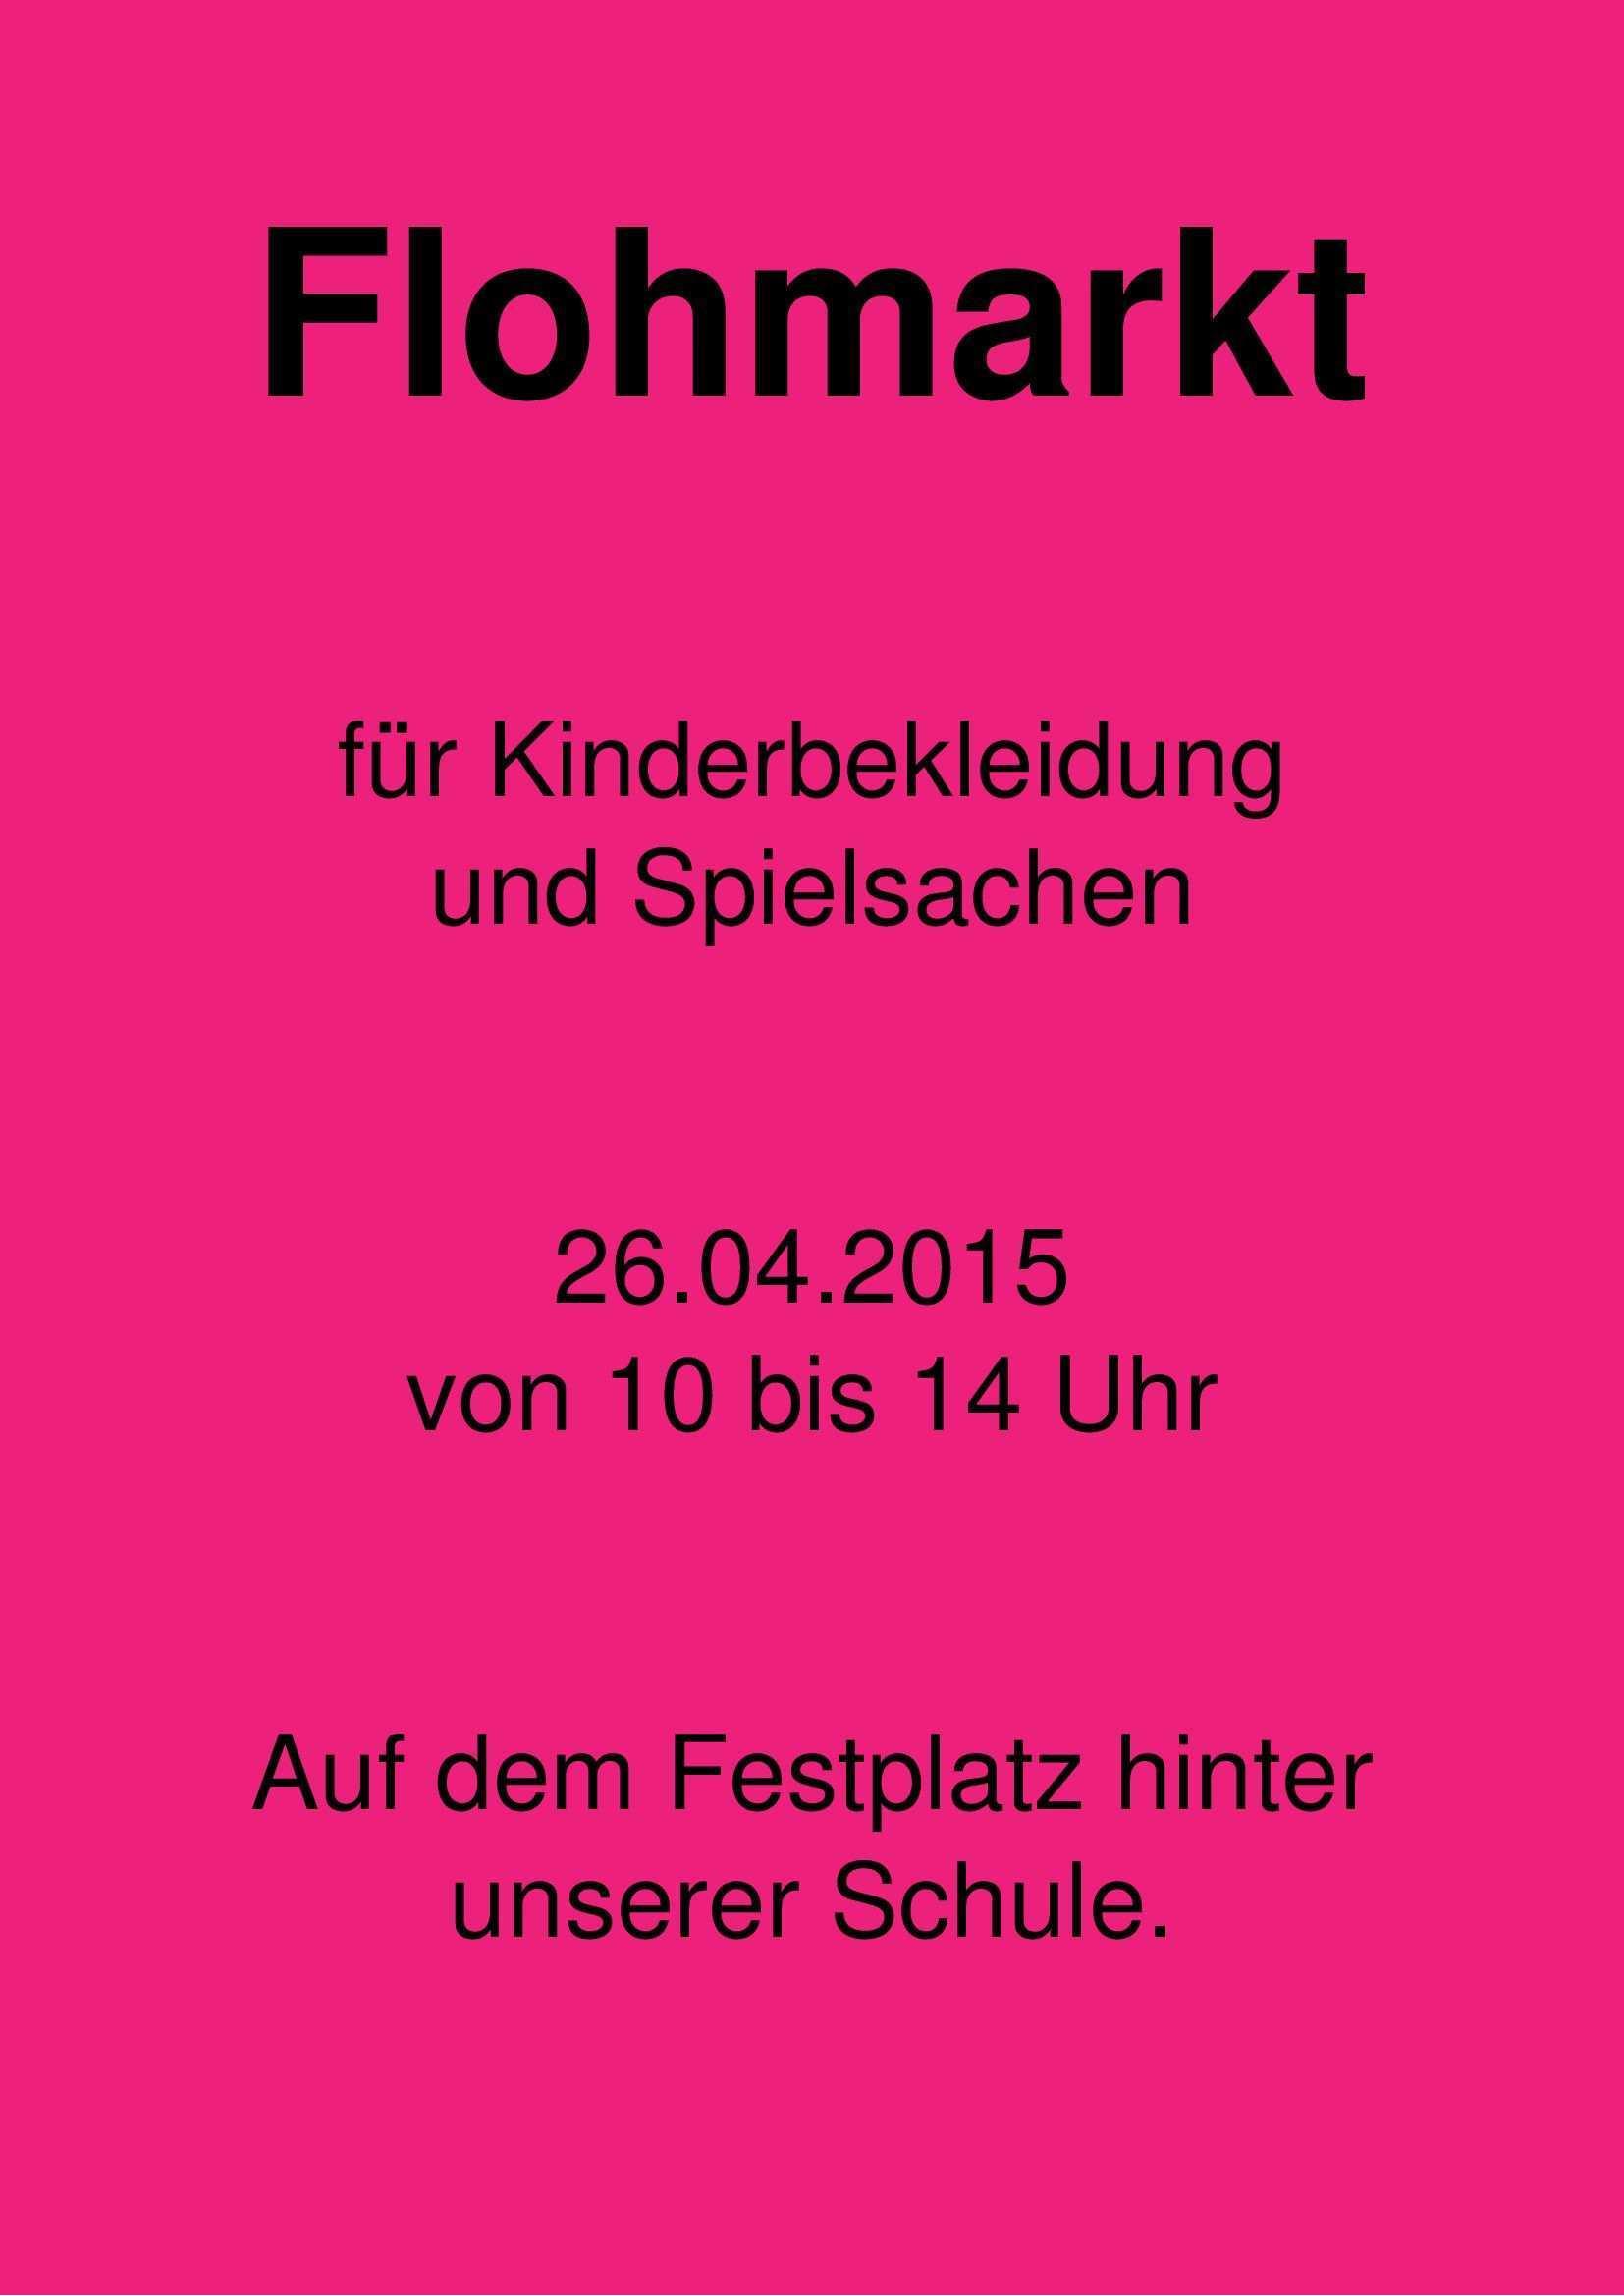 Flohmarkt By Astra On 365layouts Flyer Flea Market Templates